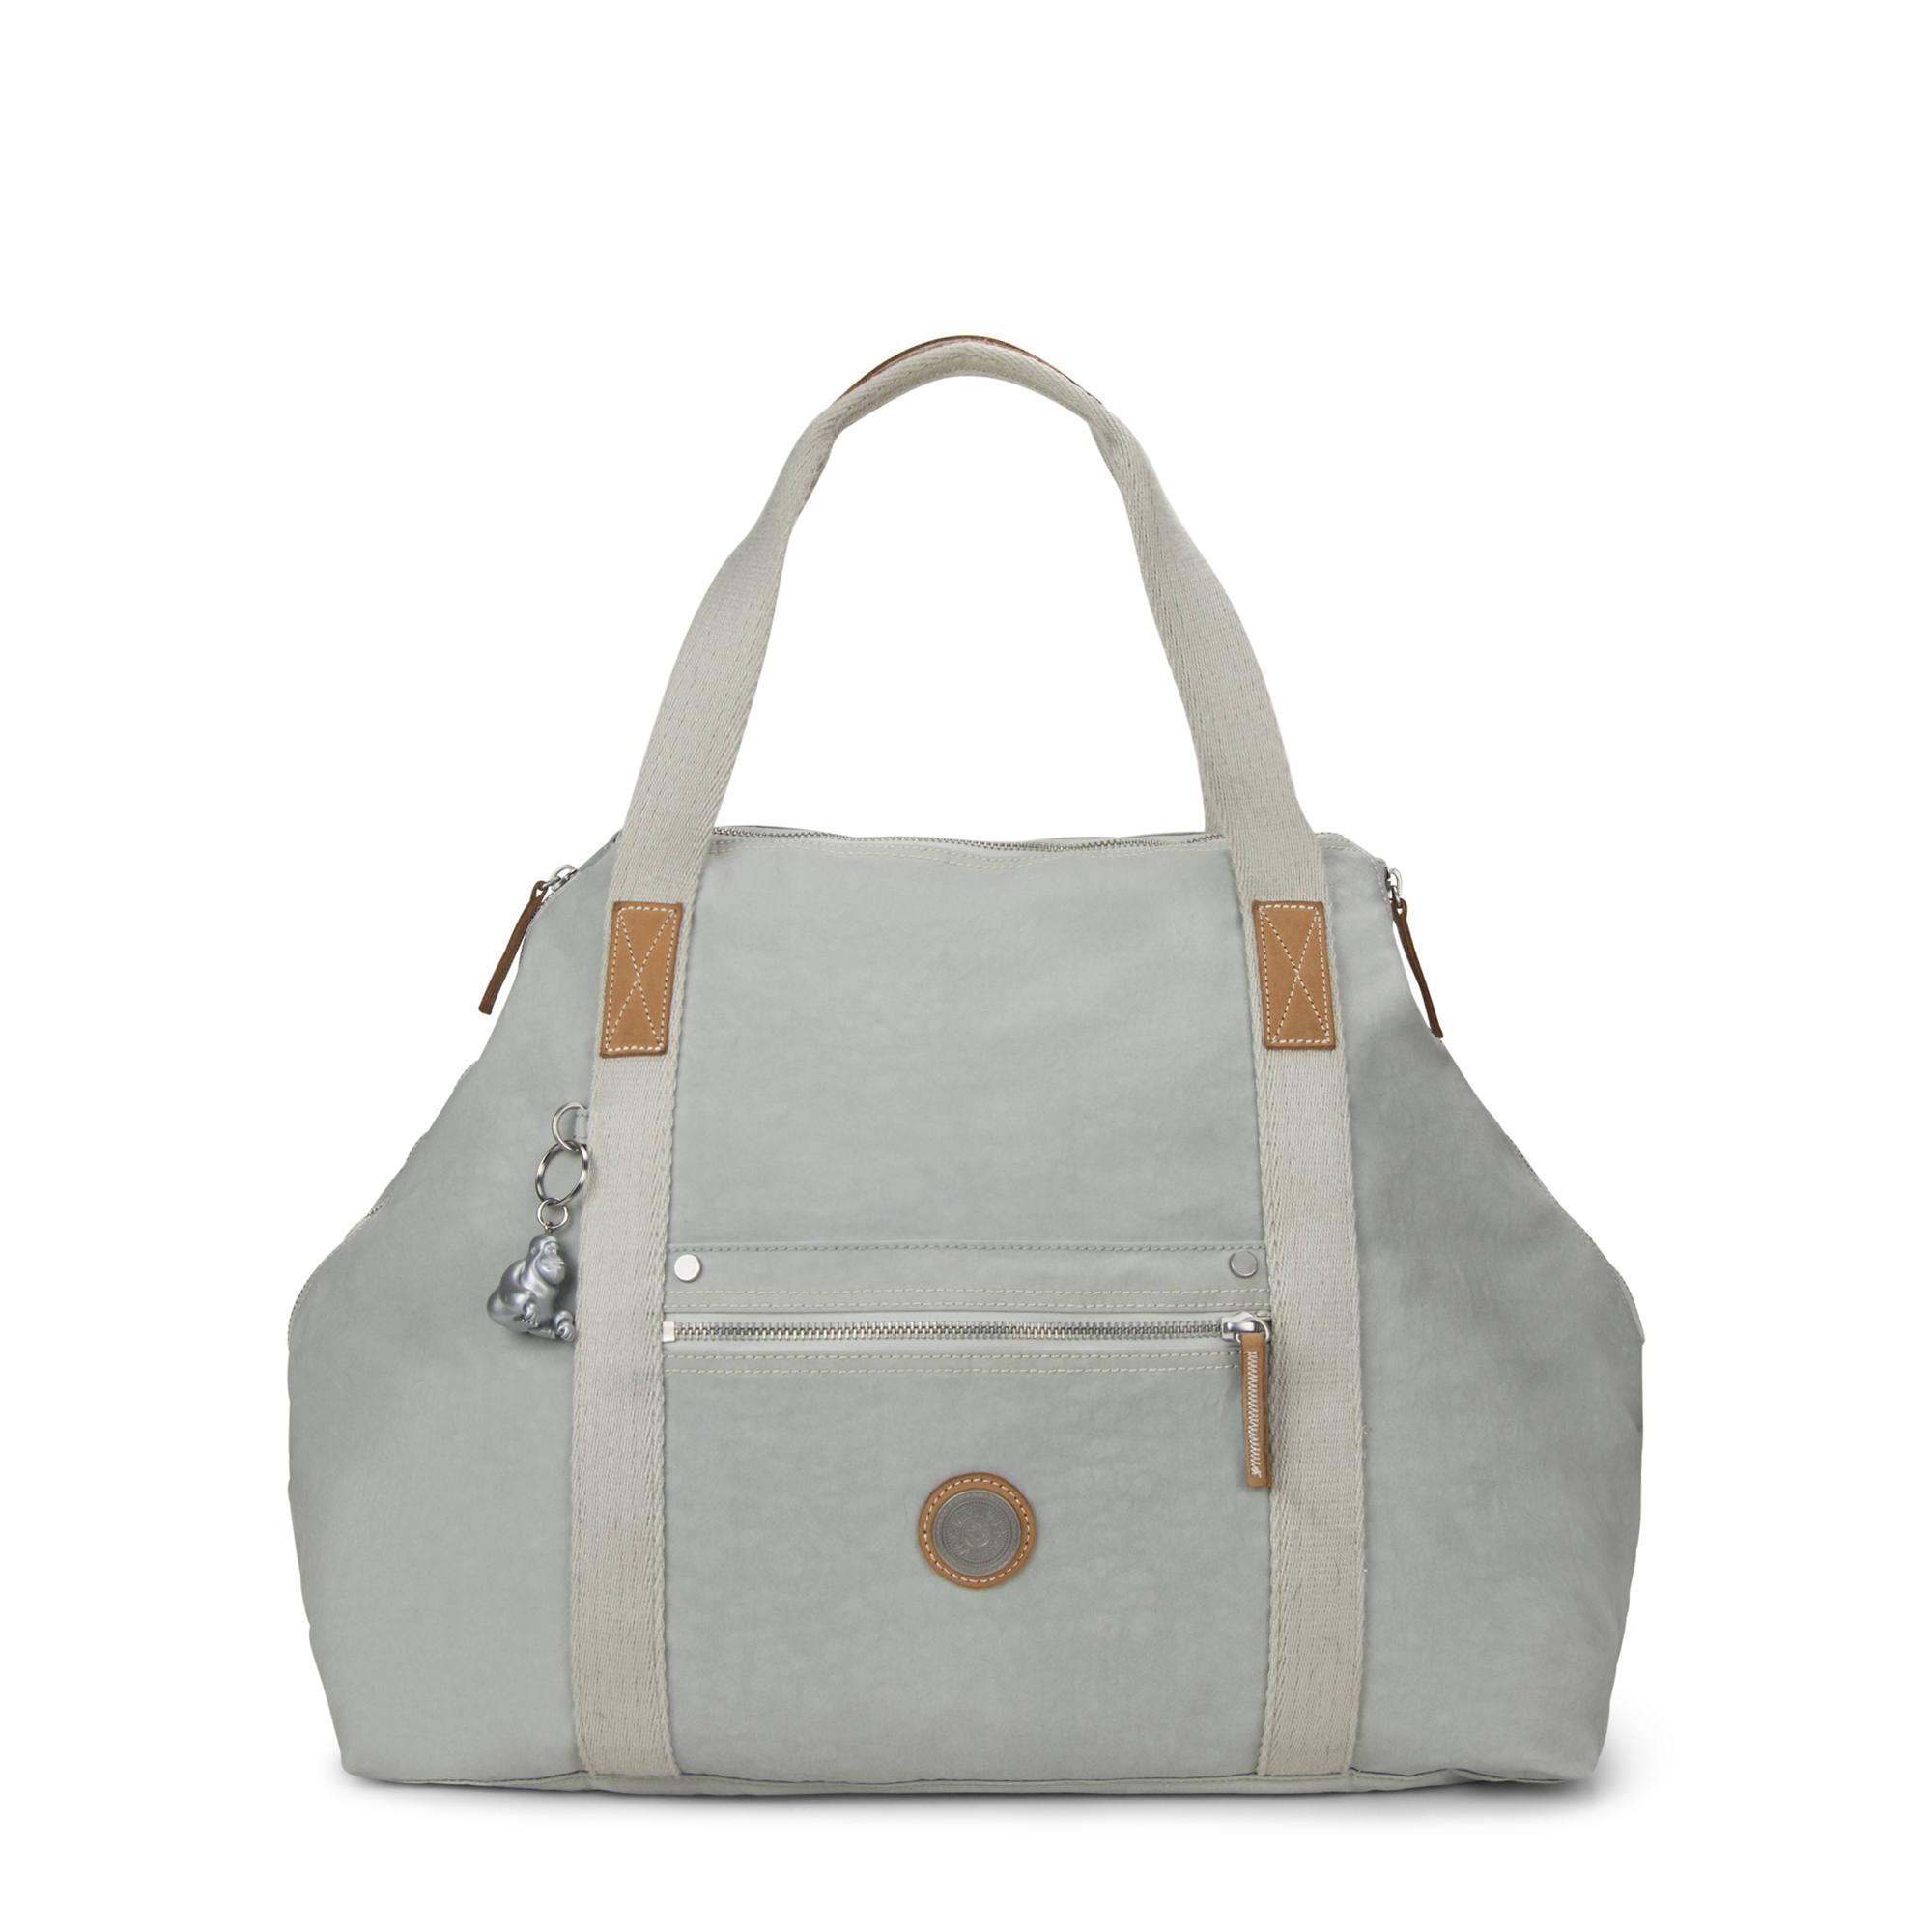 259bc6b352 Art Medium Tote Bag,Aged White BL,large